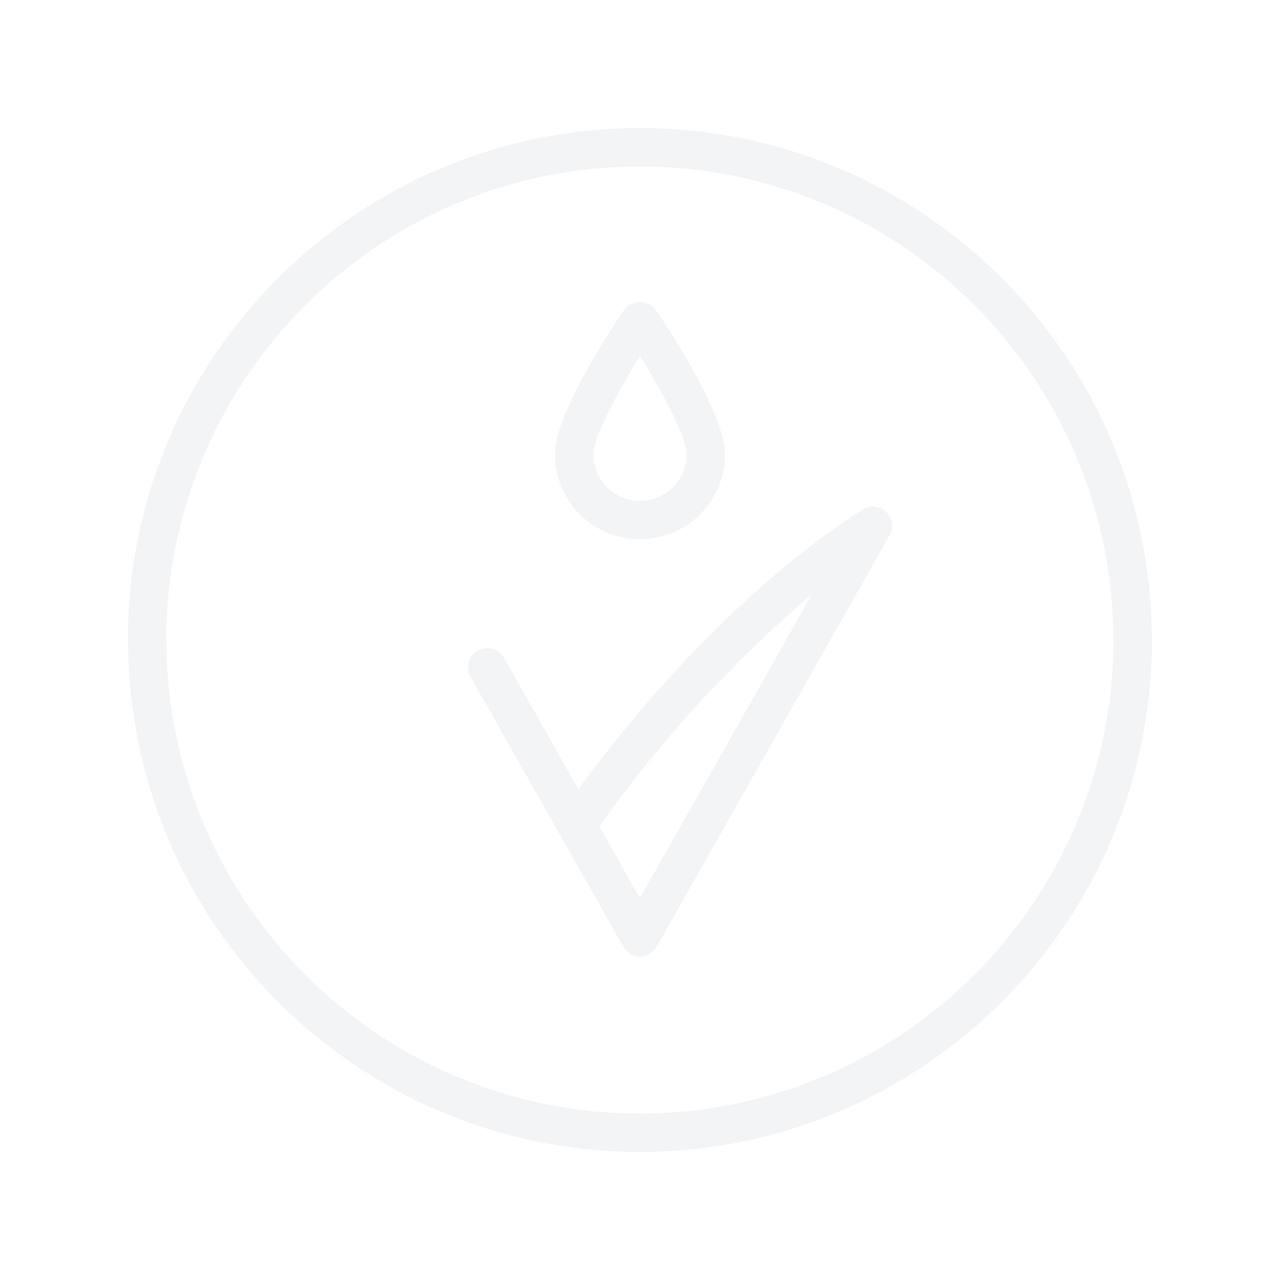 Shiseido Radiant Lifting Foundation SPF 15 No I00 Very Light Ivory 30ml